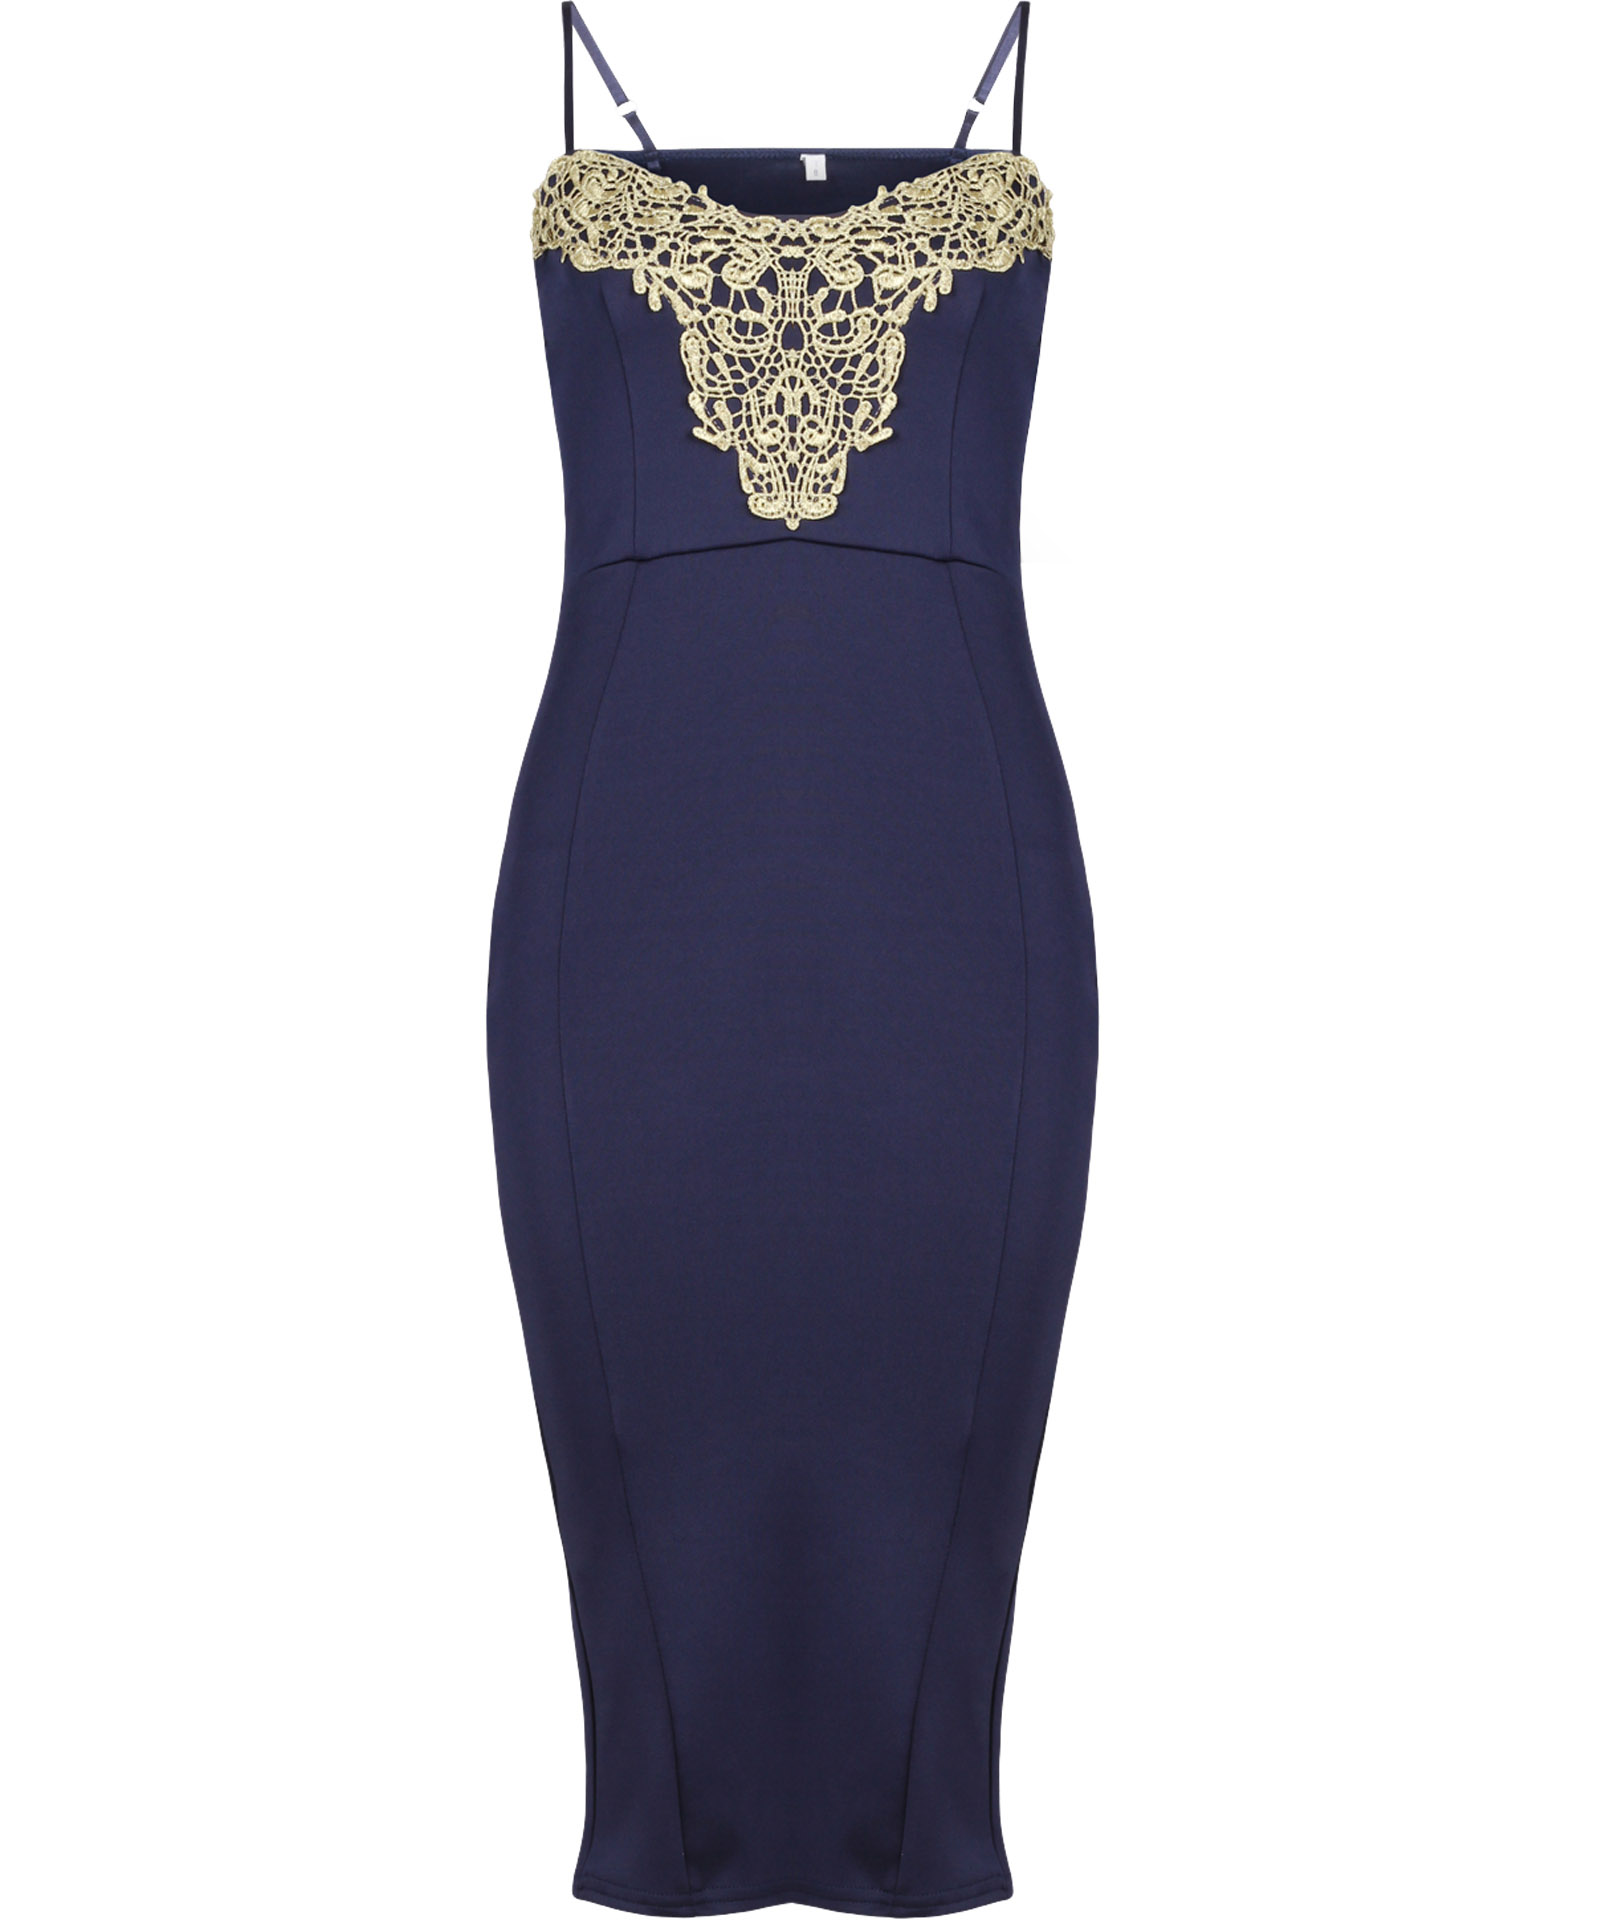 View Item Gold Embellished Midi Dress